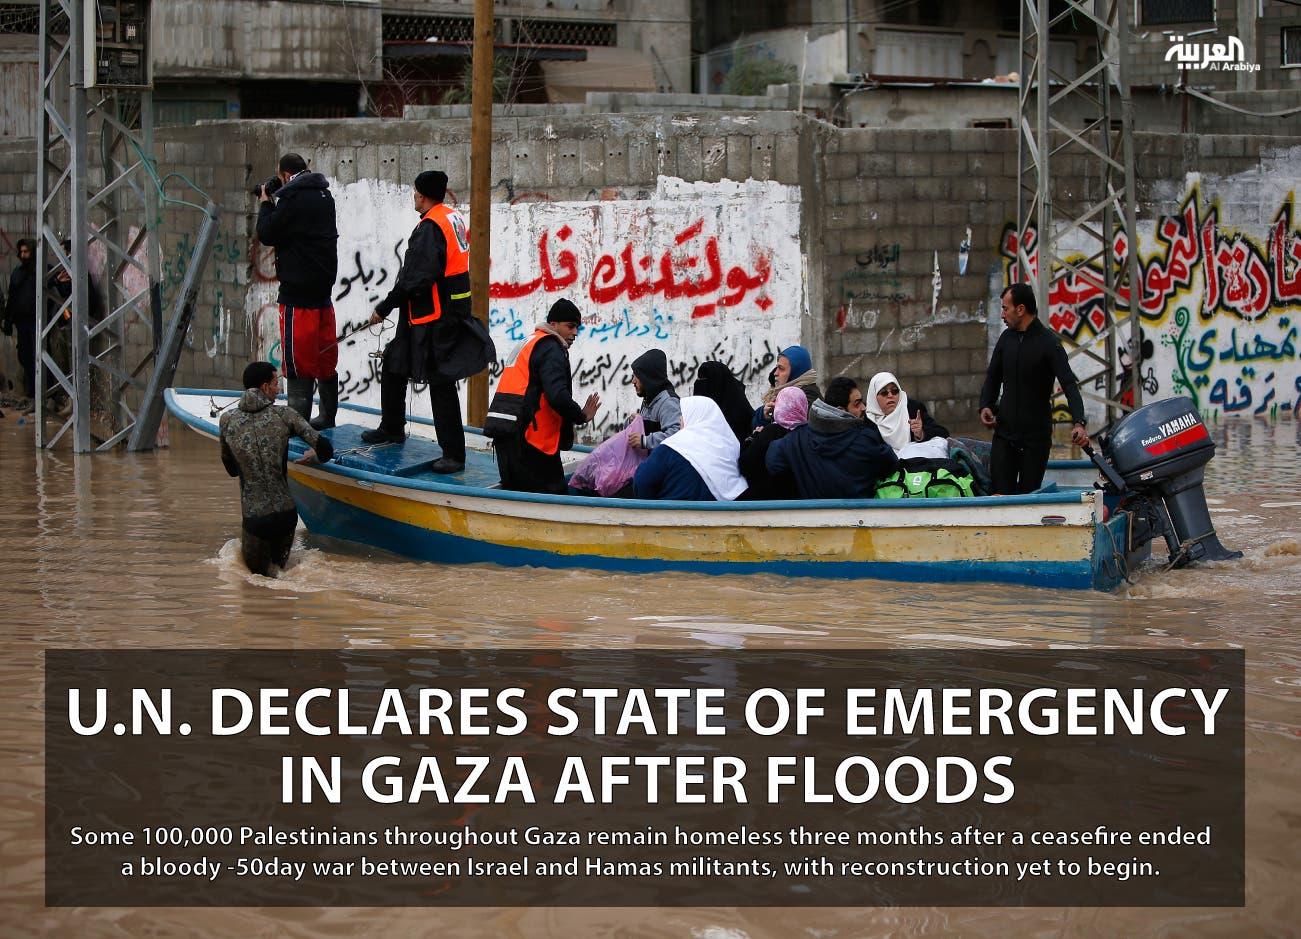 U.N. declares state of emergency in Gaza after floods